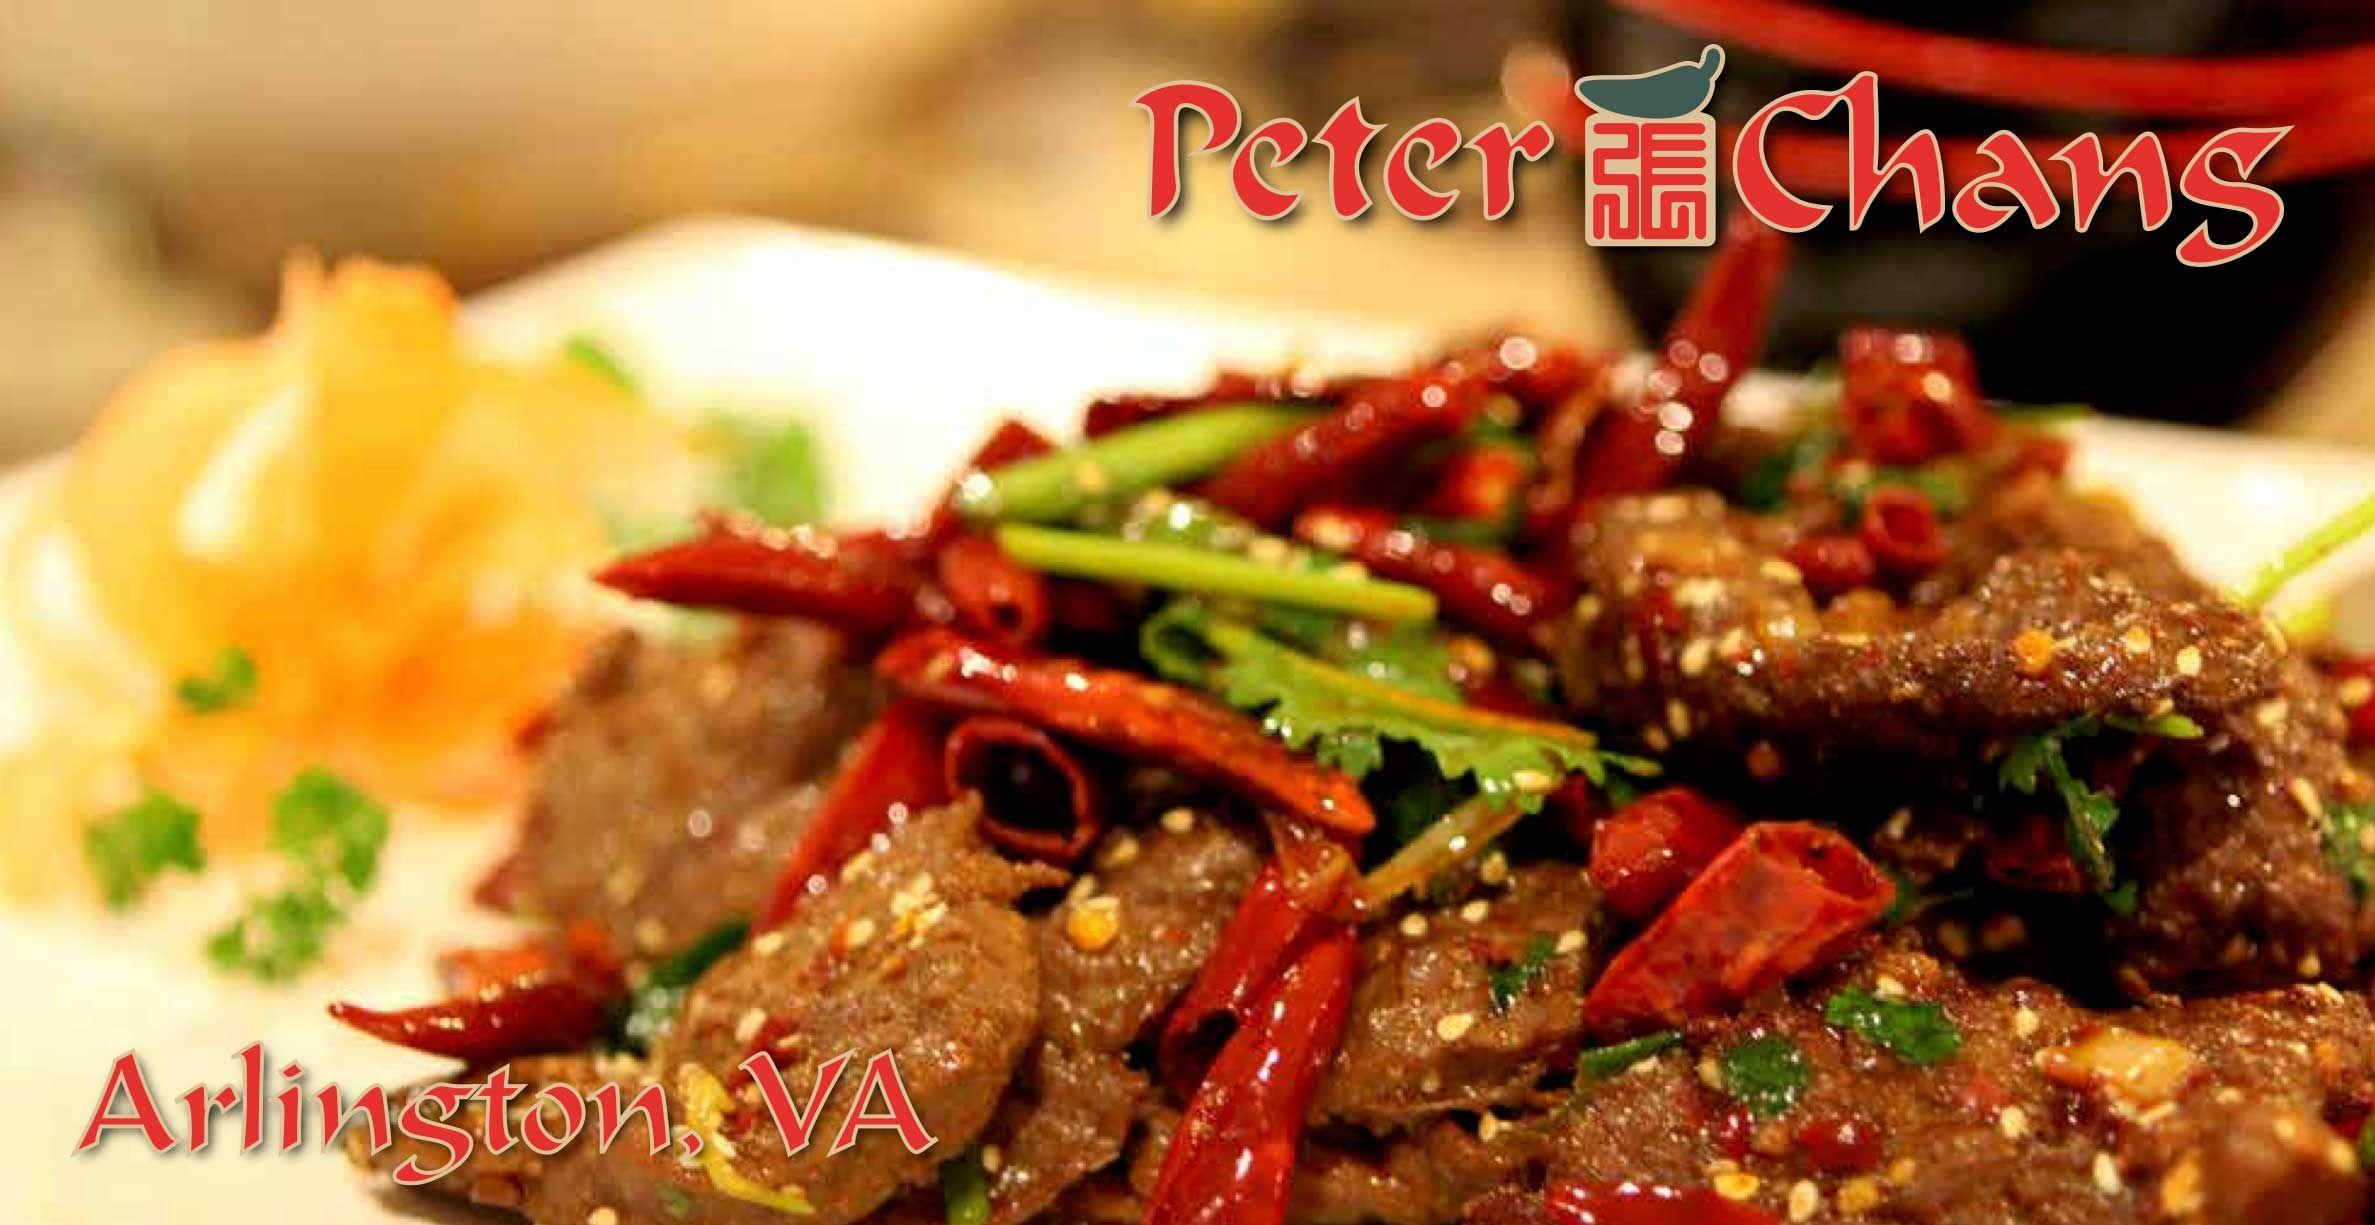 Peter Chang Chinese Dishes Food Washington Dc Restaurants